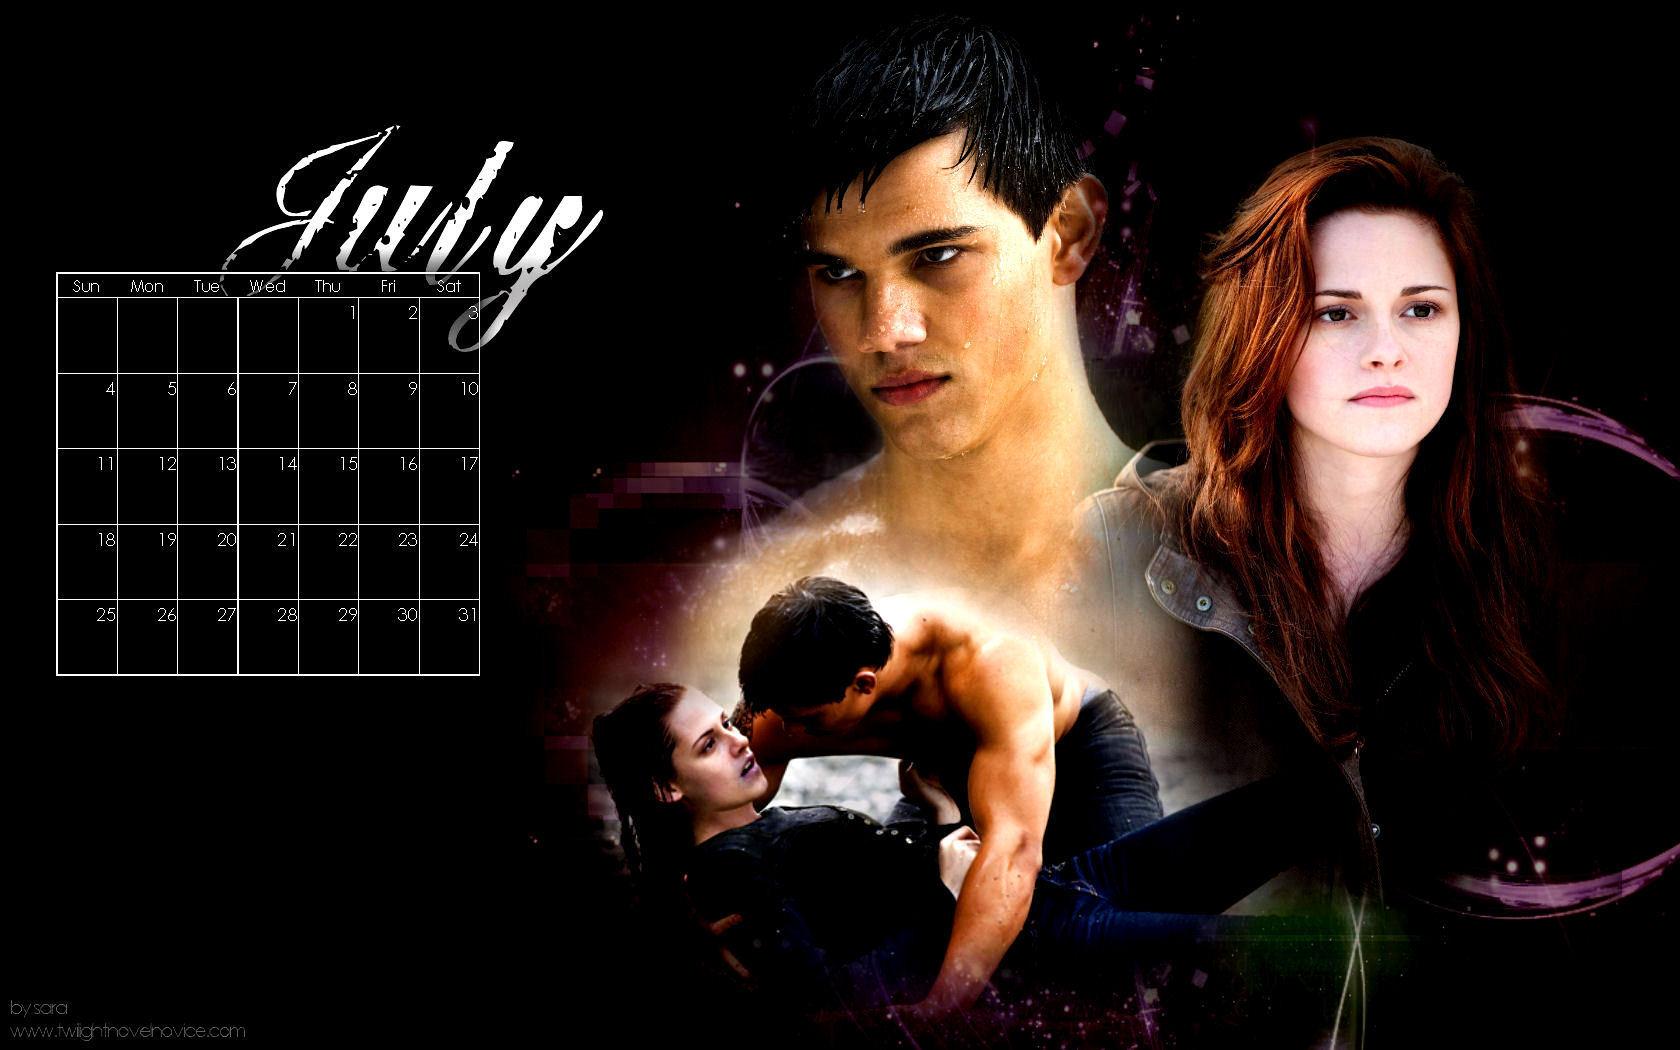 twilight saga 2010 desktop wallpaper calendar from novel